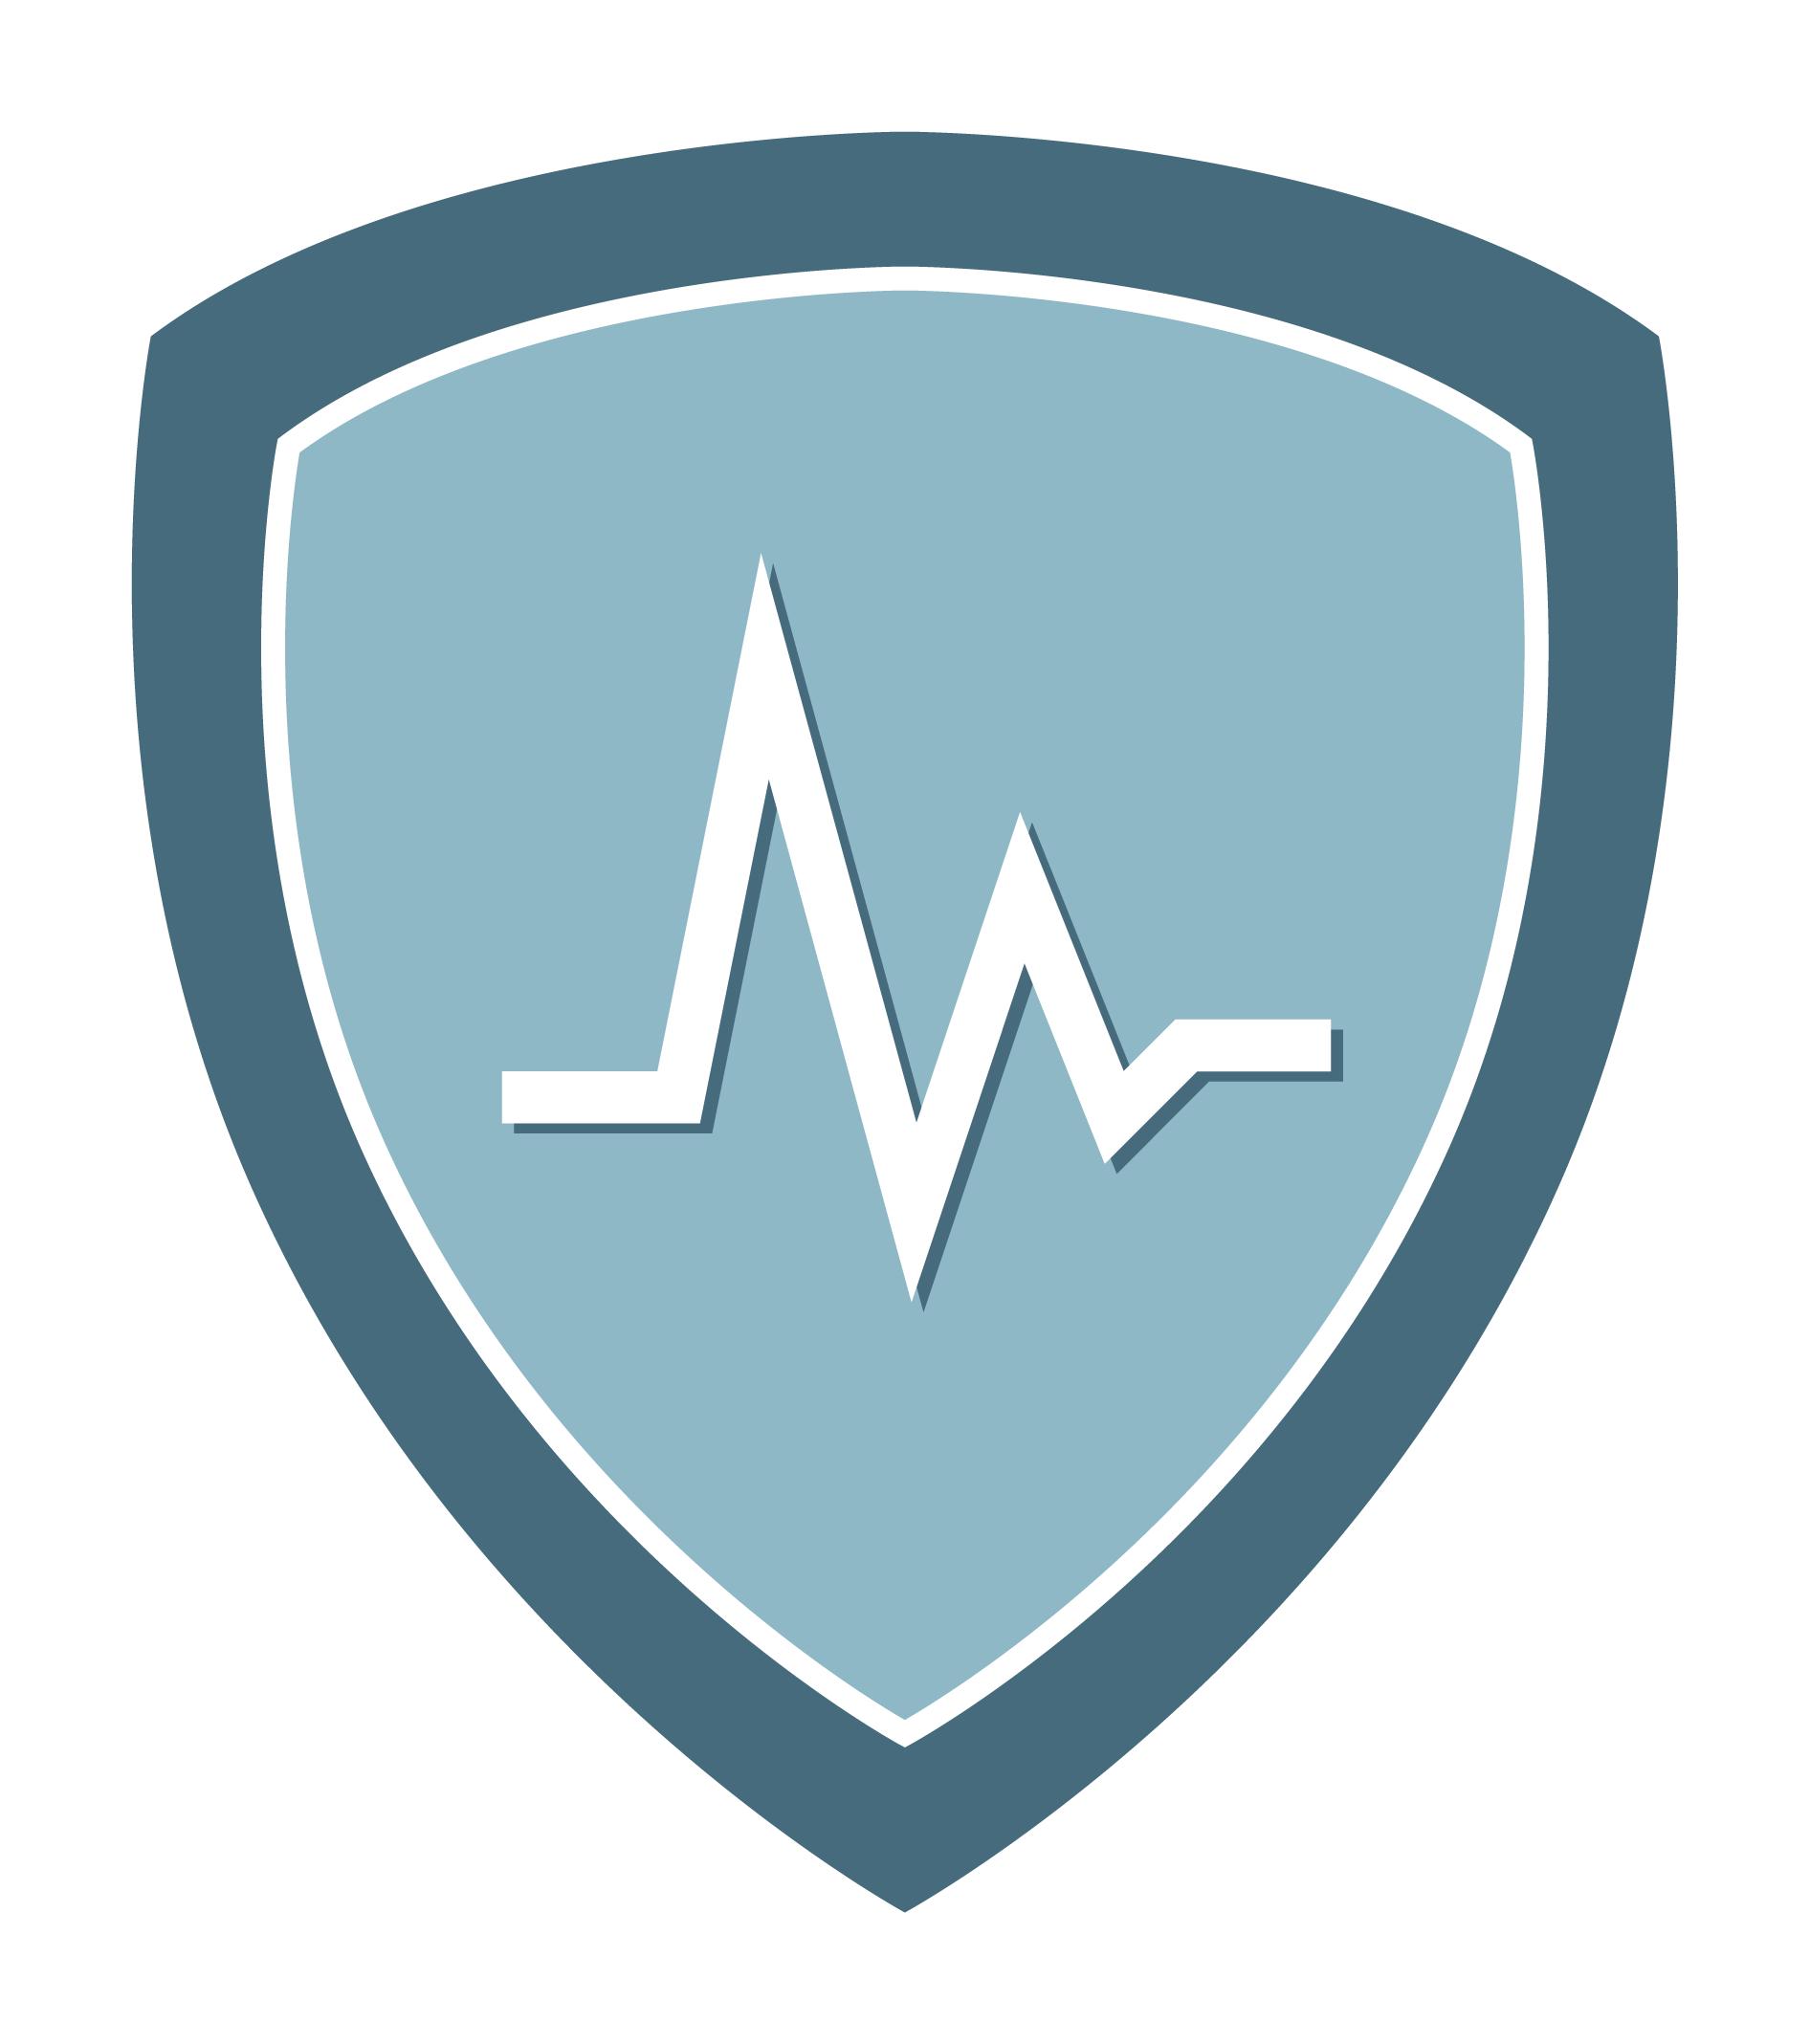 SurfWatch Risk Monitor Shield